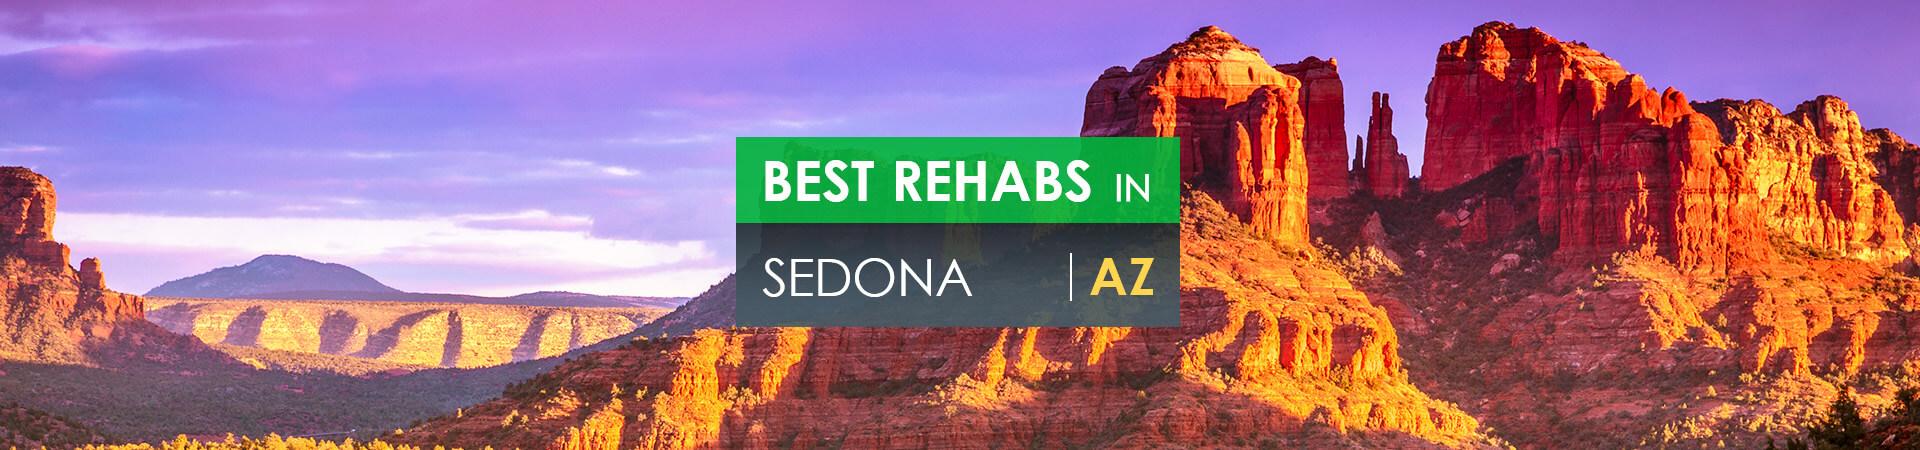 Best rehabs in Sedona, AZ